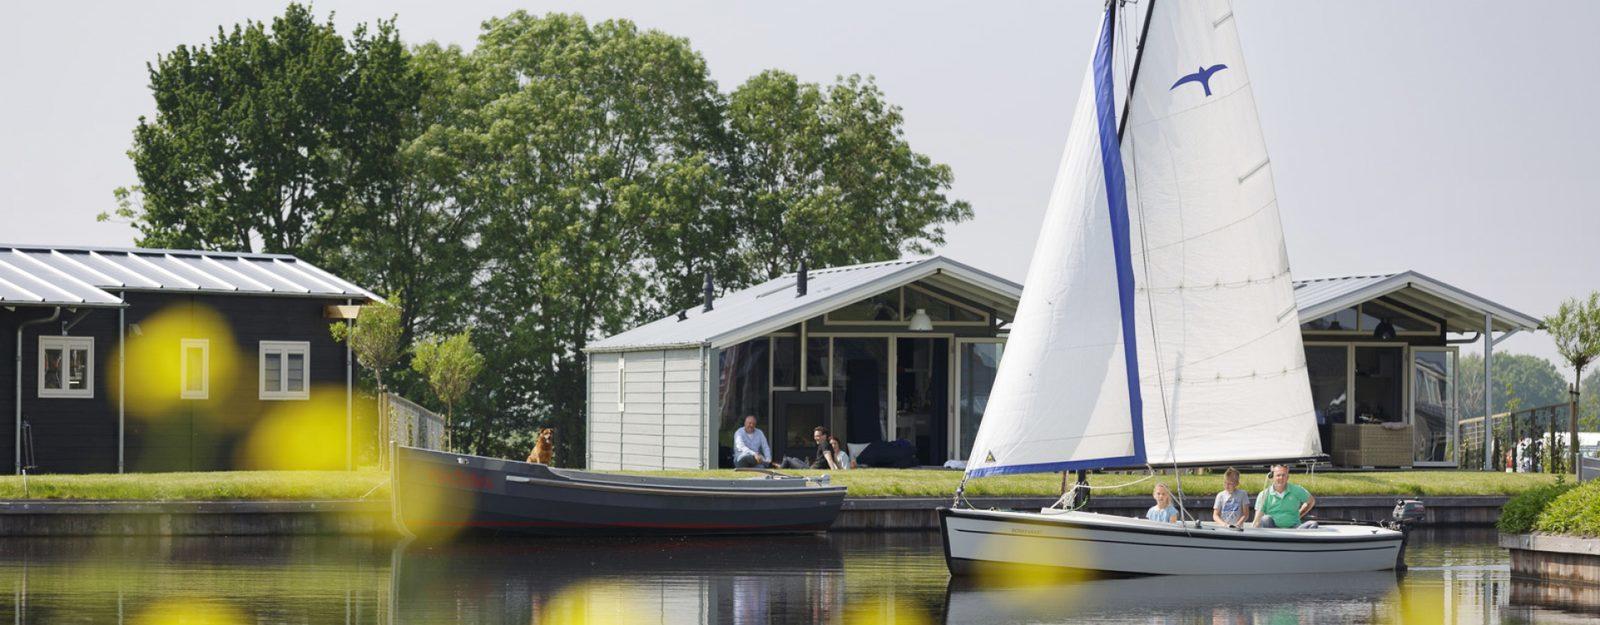 Vrijrijck - Waterpark Terkaple